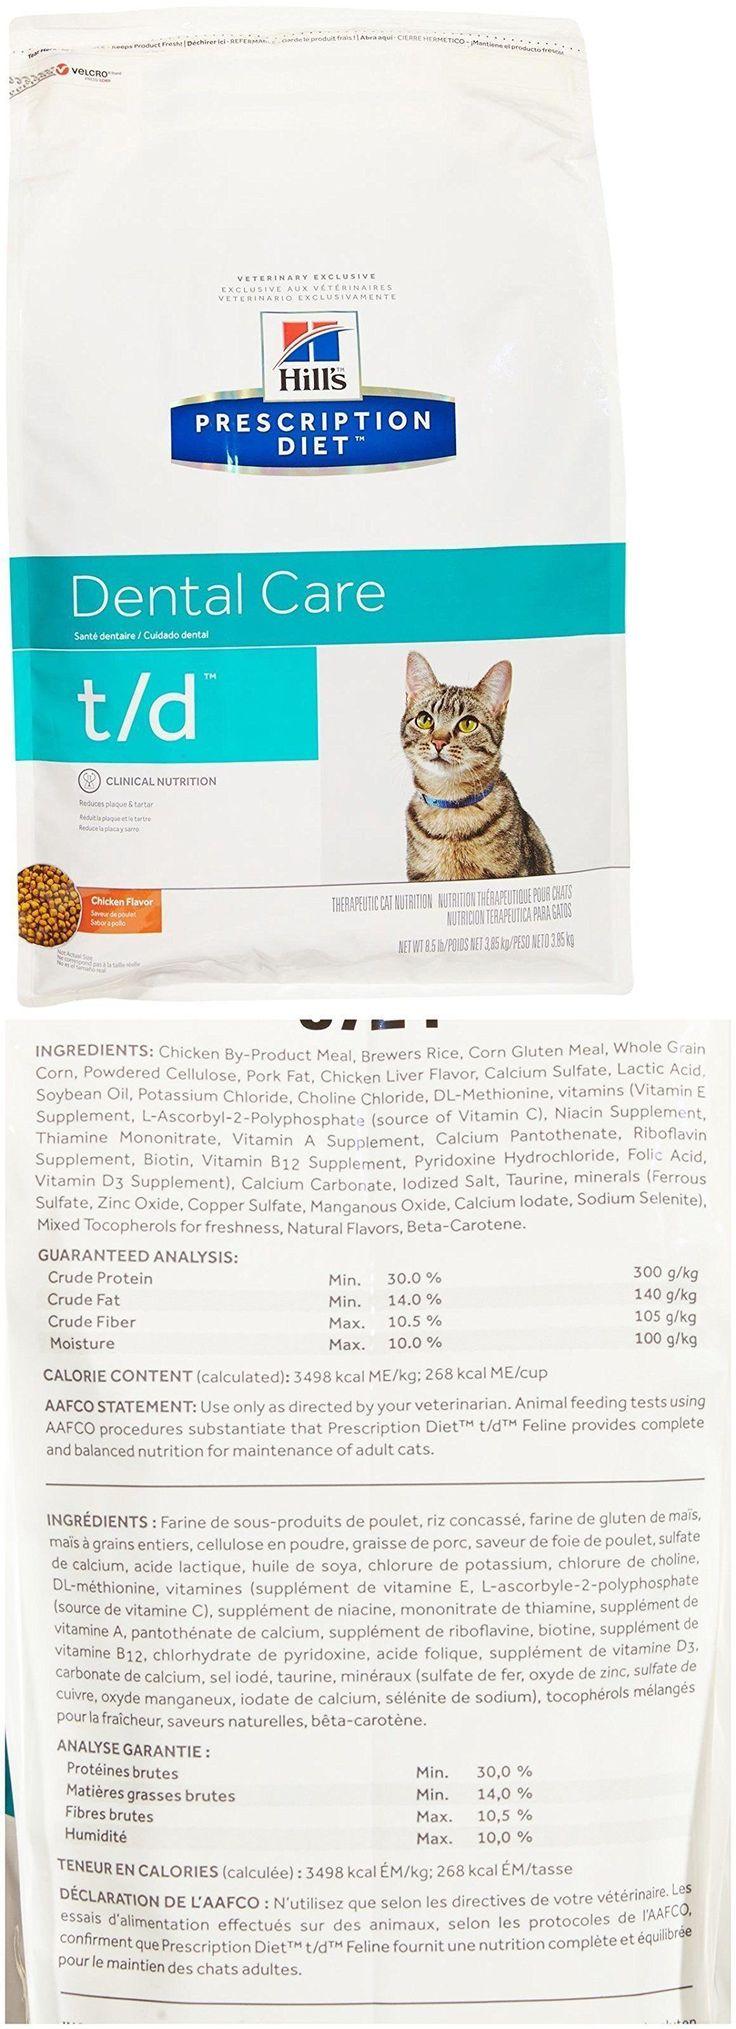 Cat Food 63073: Hills Prescription Diet T D Feline Dental Health - 8.5Lb -> BUY IT NOW ONLY: $79.95 on eBay!